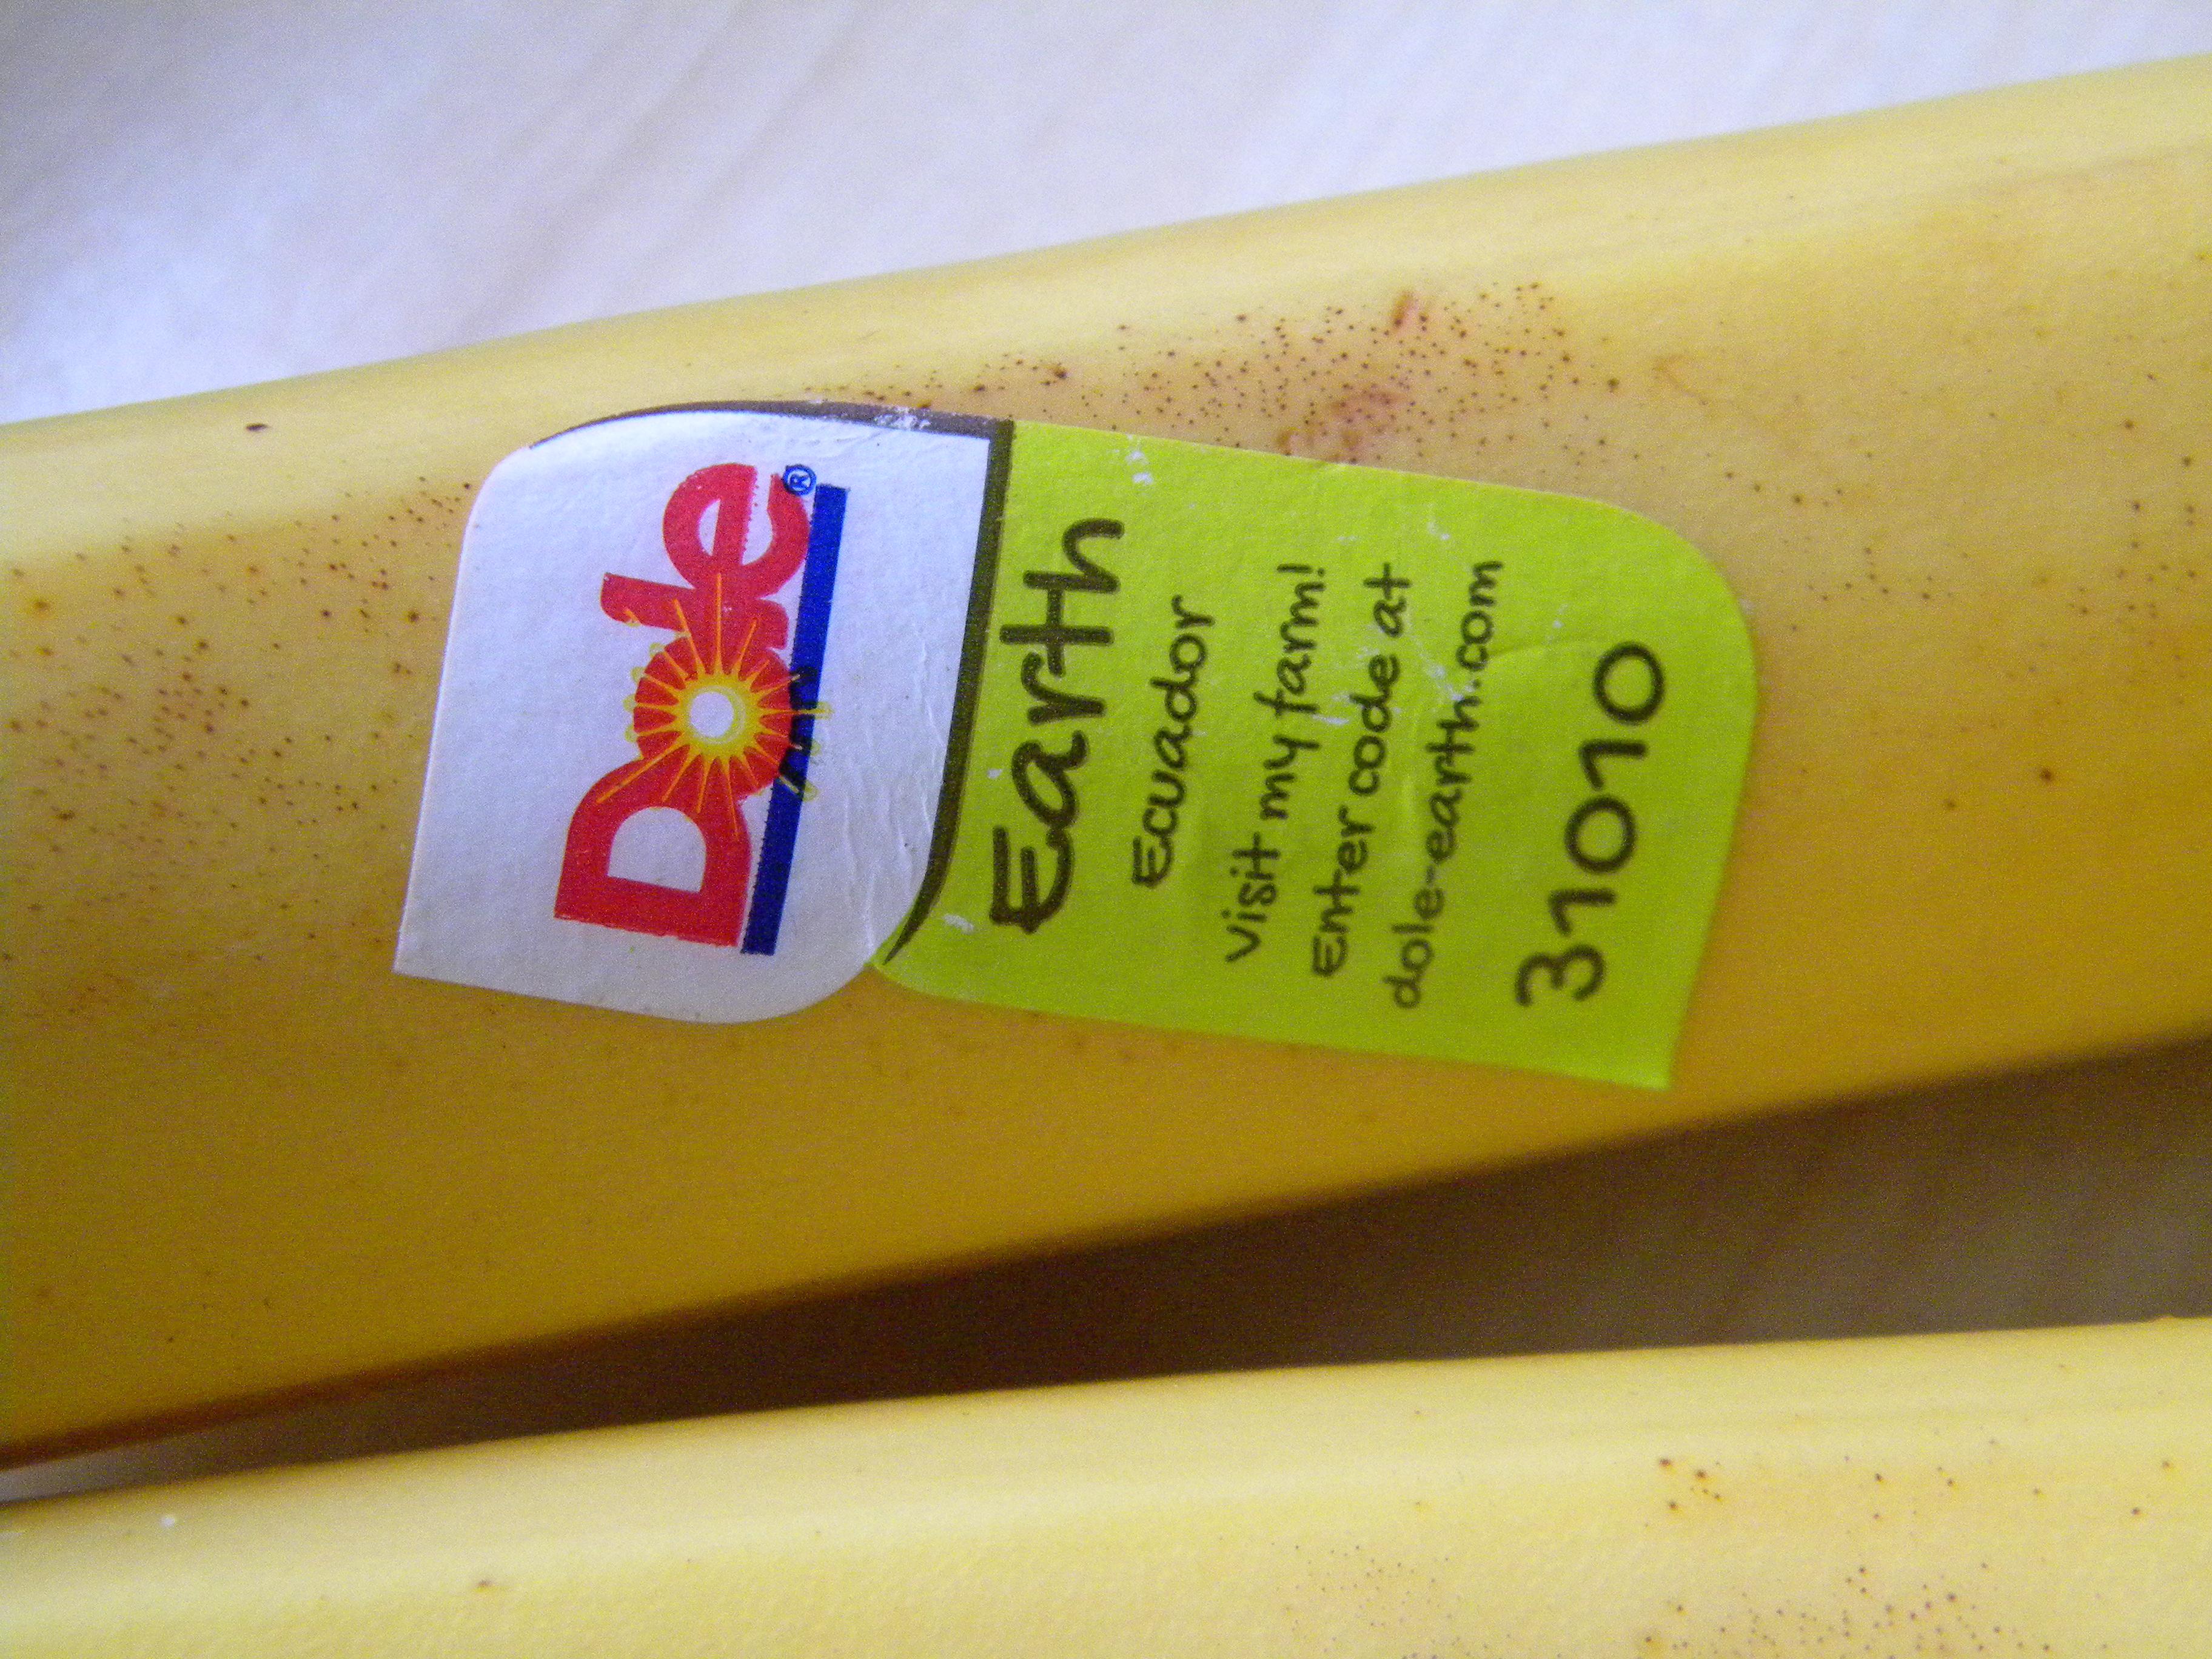 De unde vin bananele?